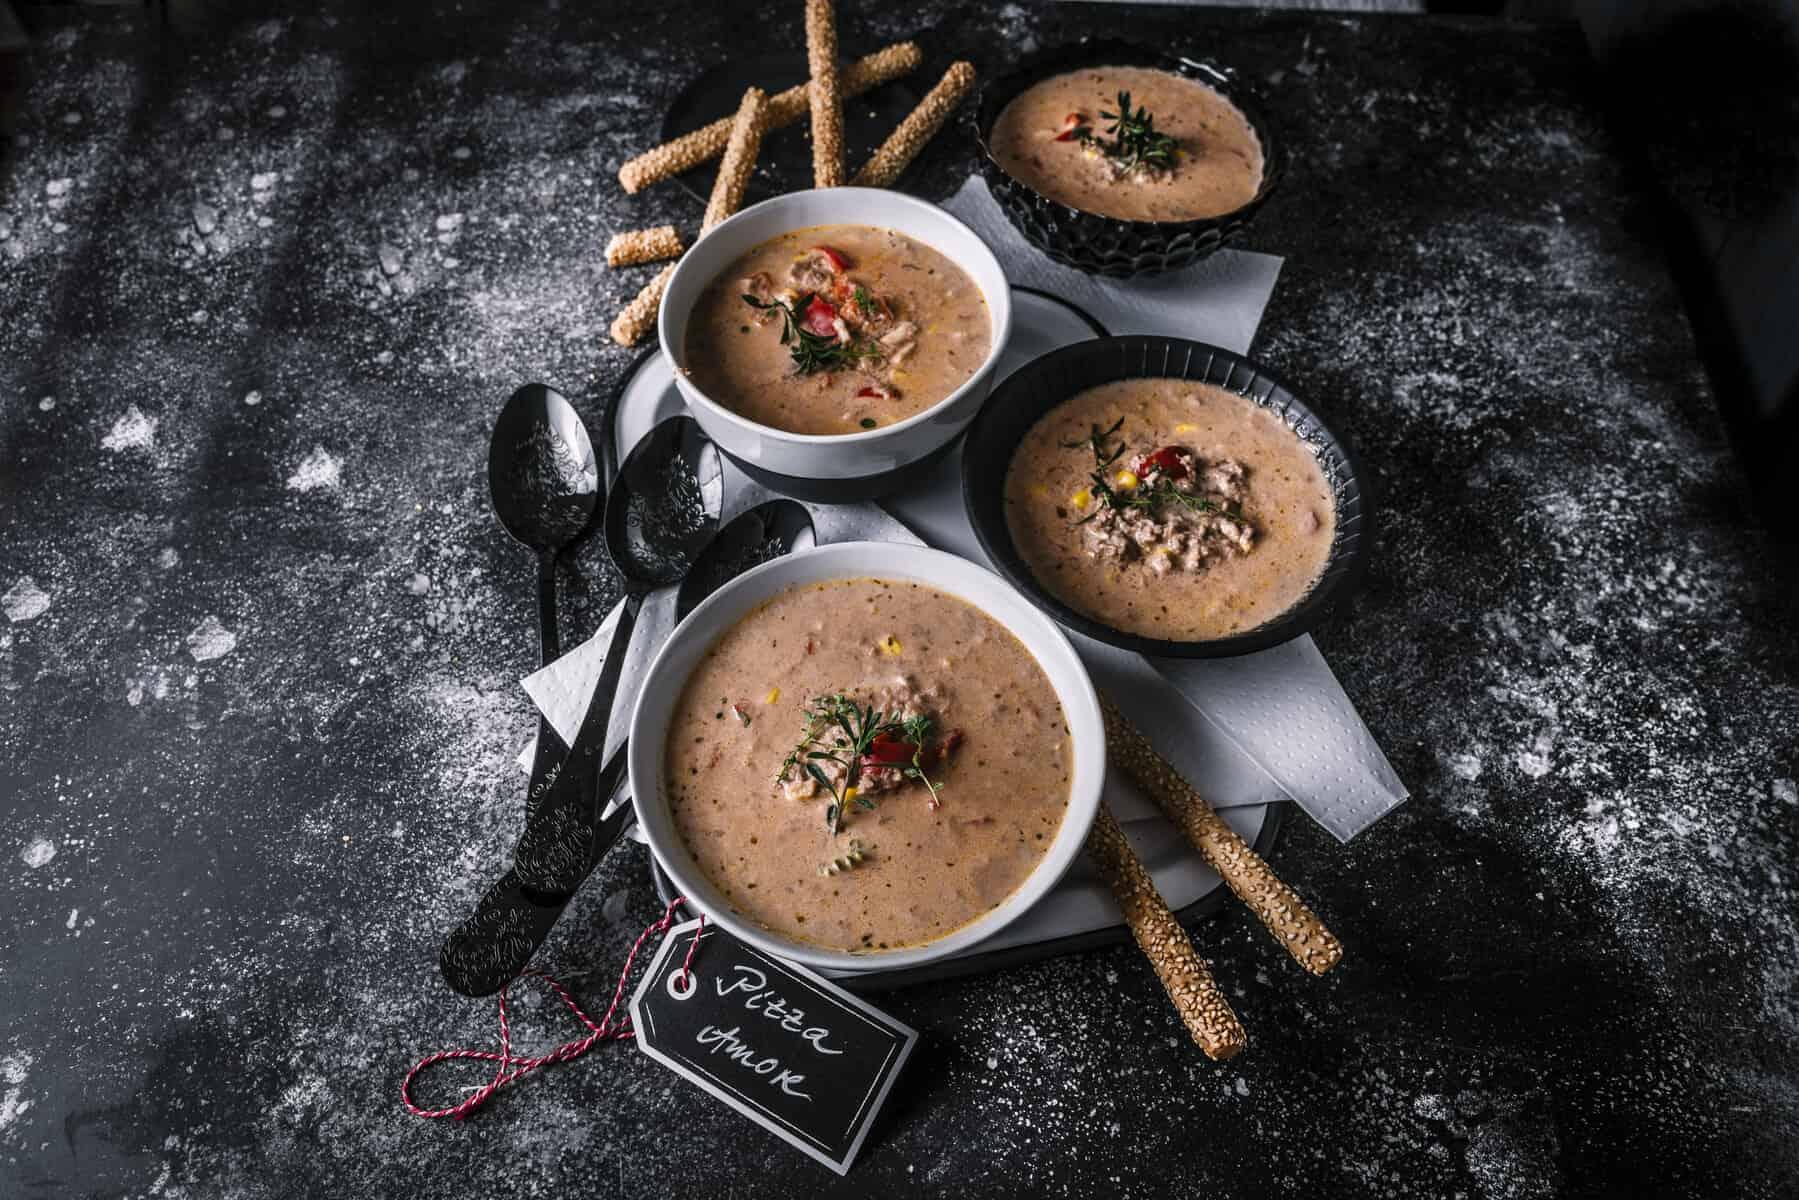 Pizza-Suppe aus dem Thermomix® –Foto: Tina Bumann